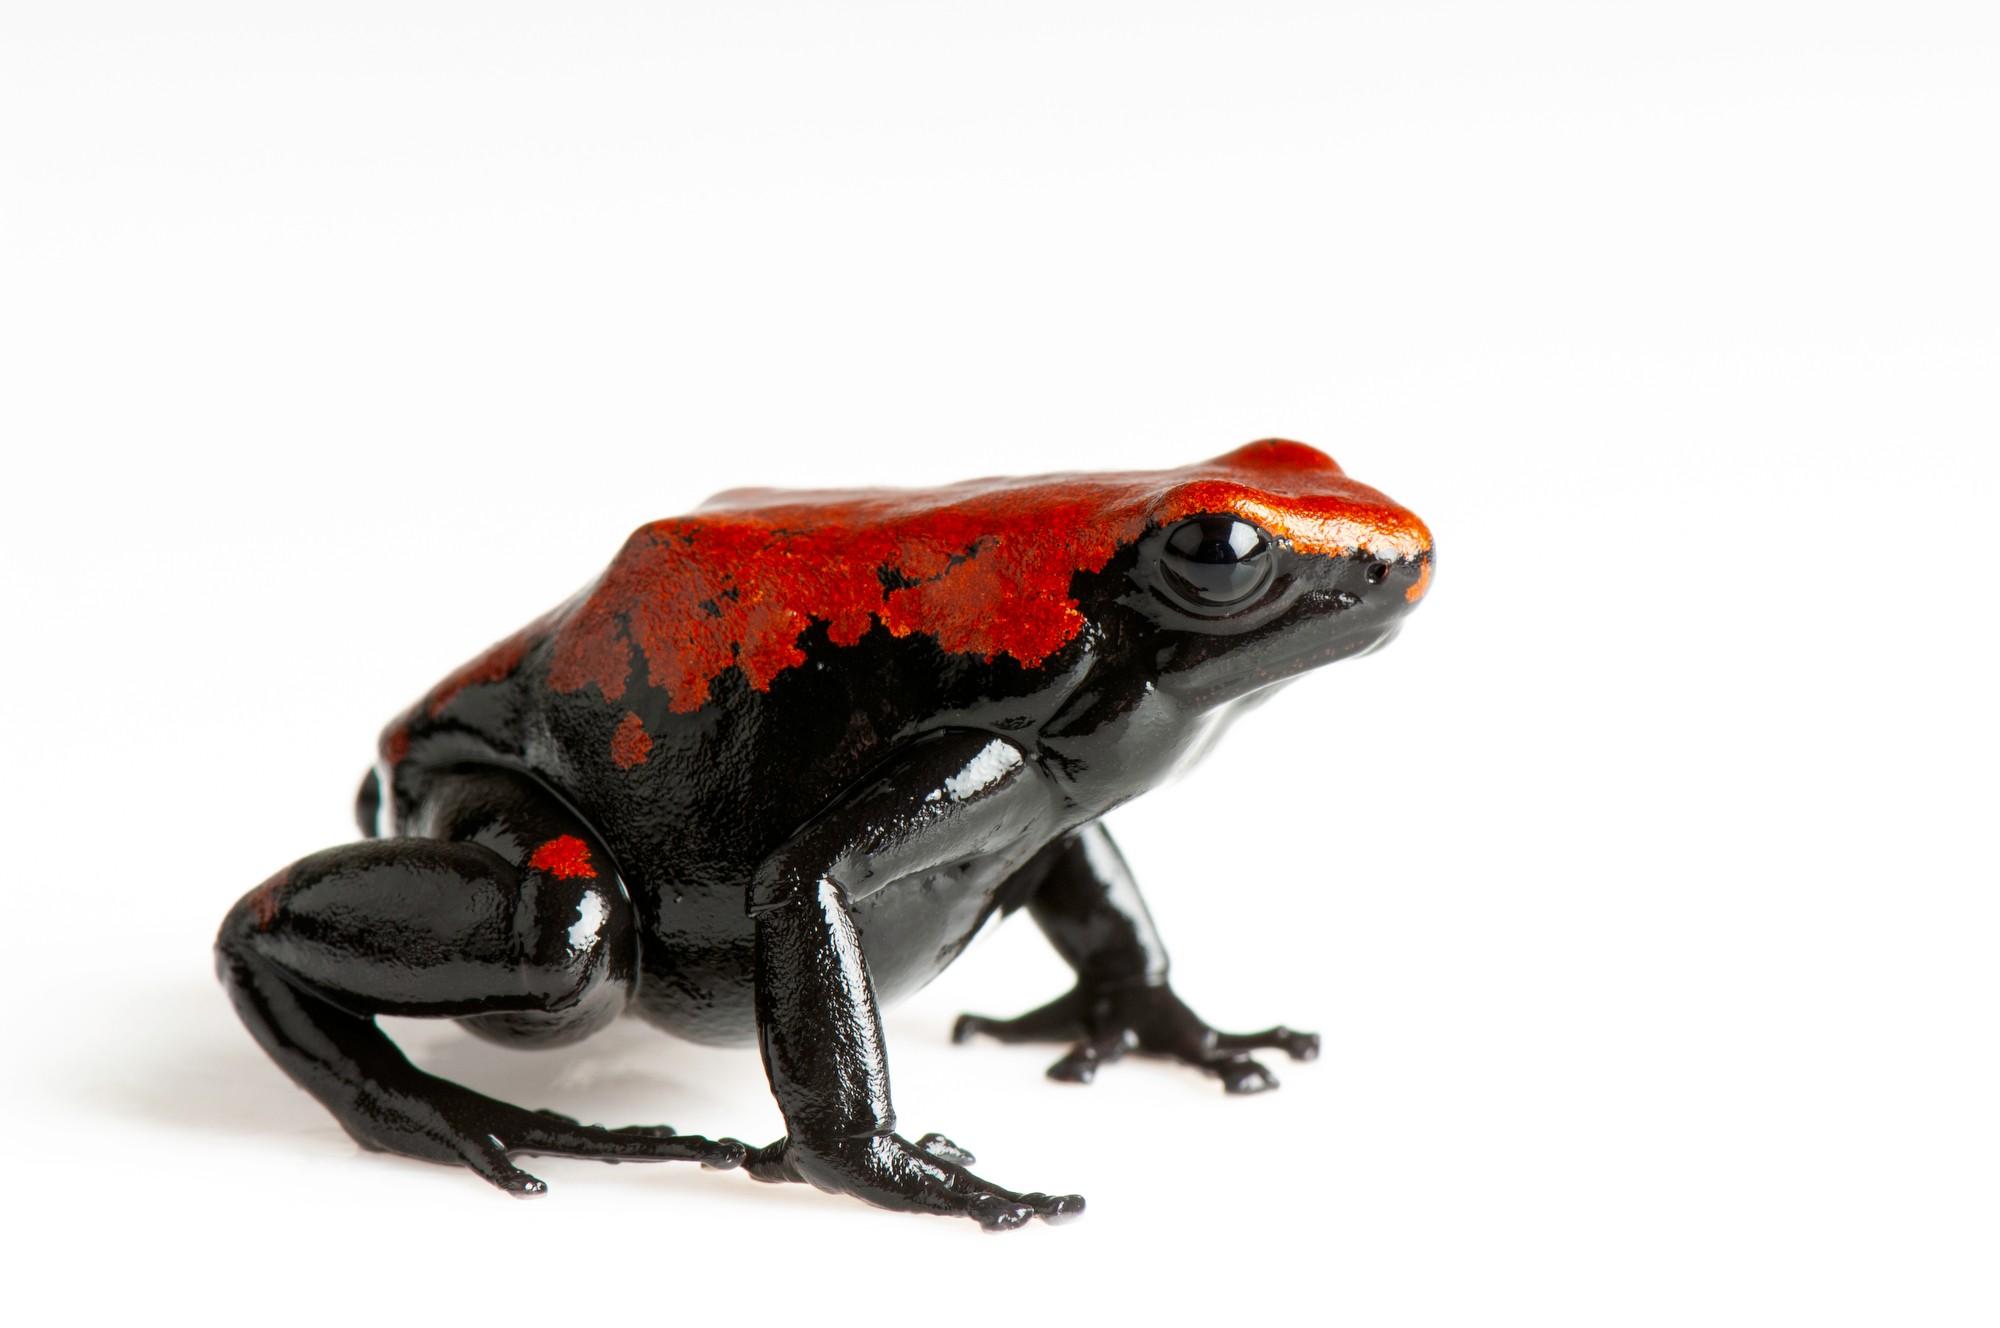 A splash-backed poison dart frog (Adelphobates galactonotus) at Omaha's Henry Doorly Zoo.